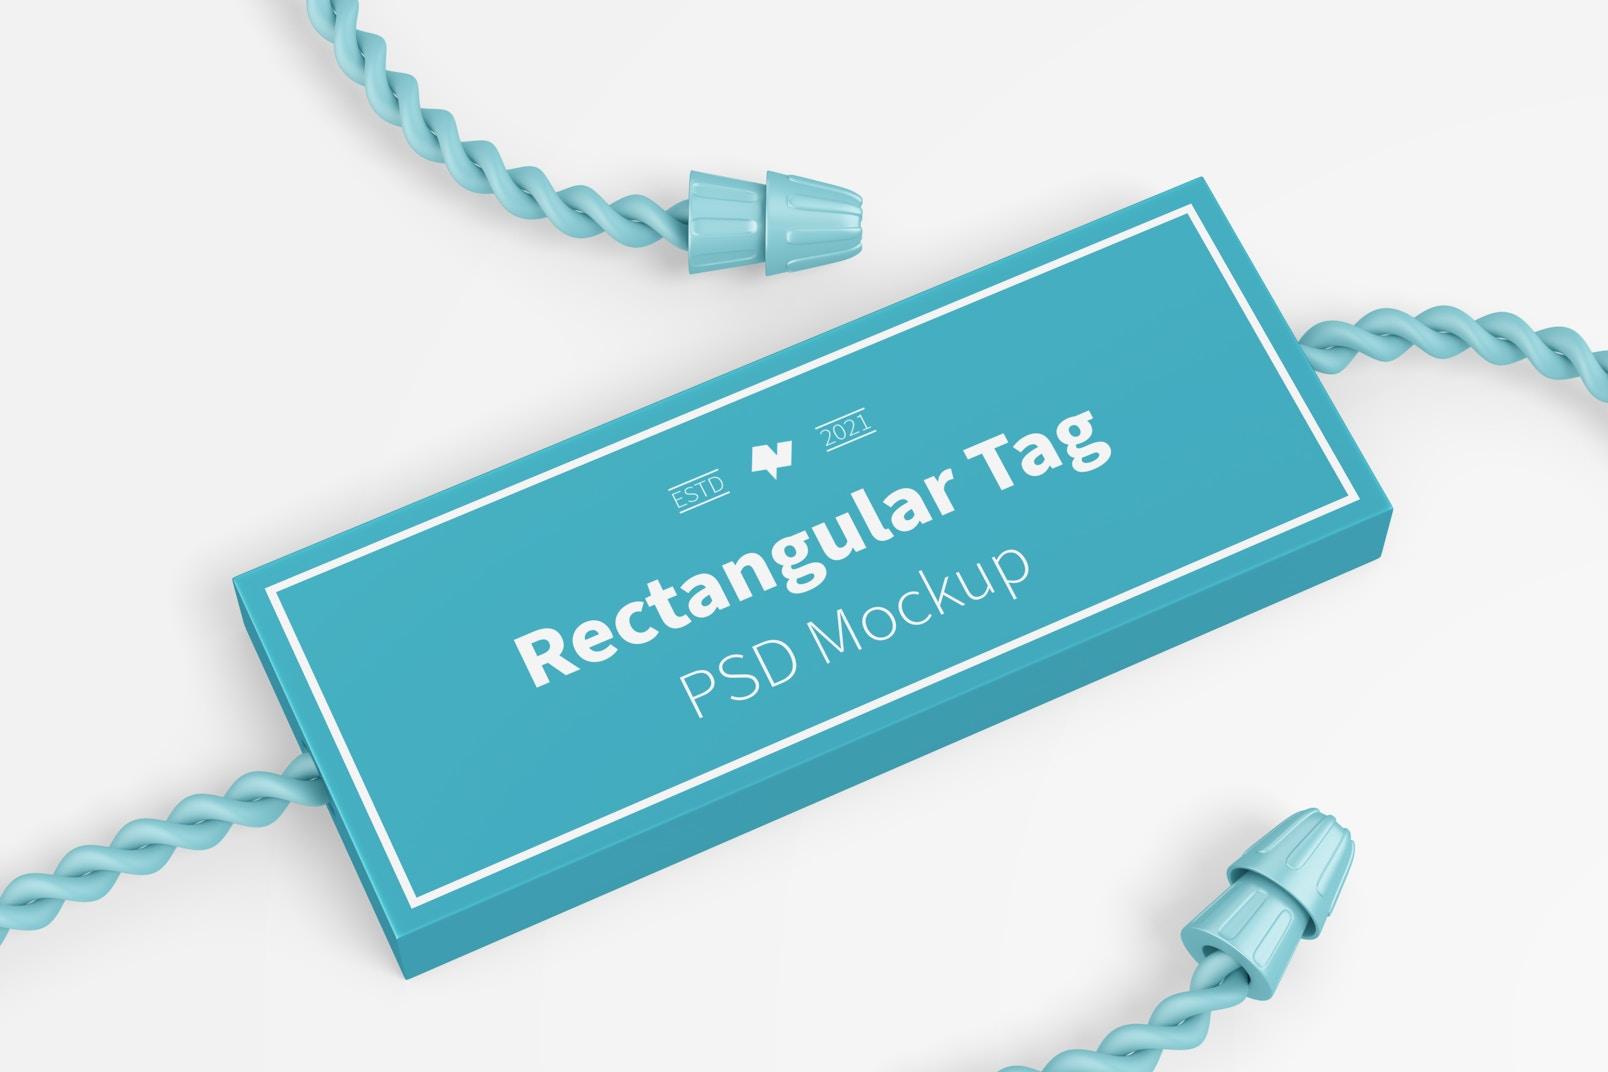 Rectangular Textile Tag Mockup, Close Up